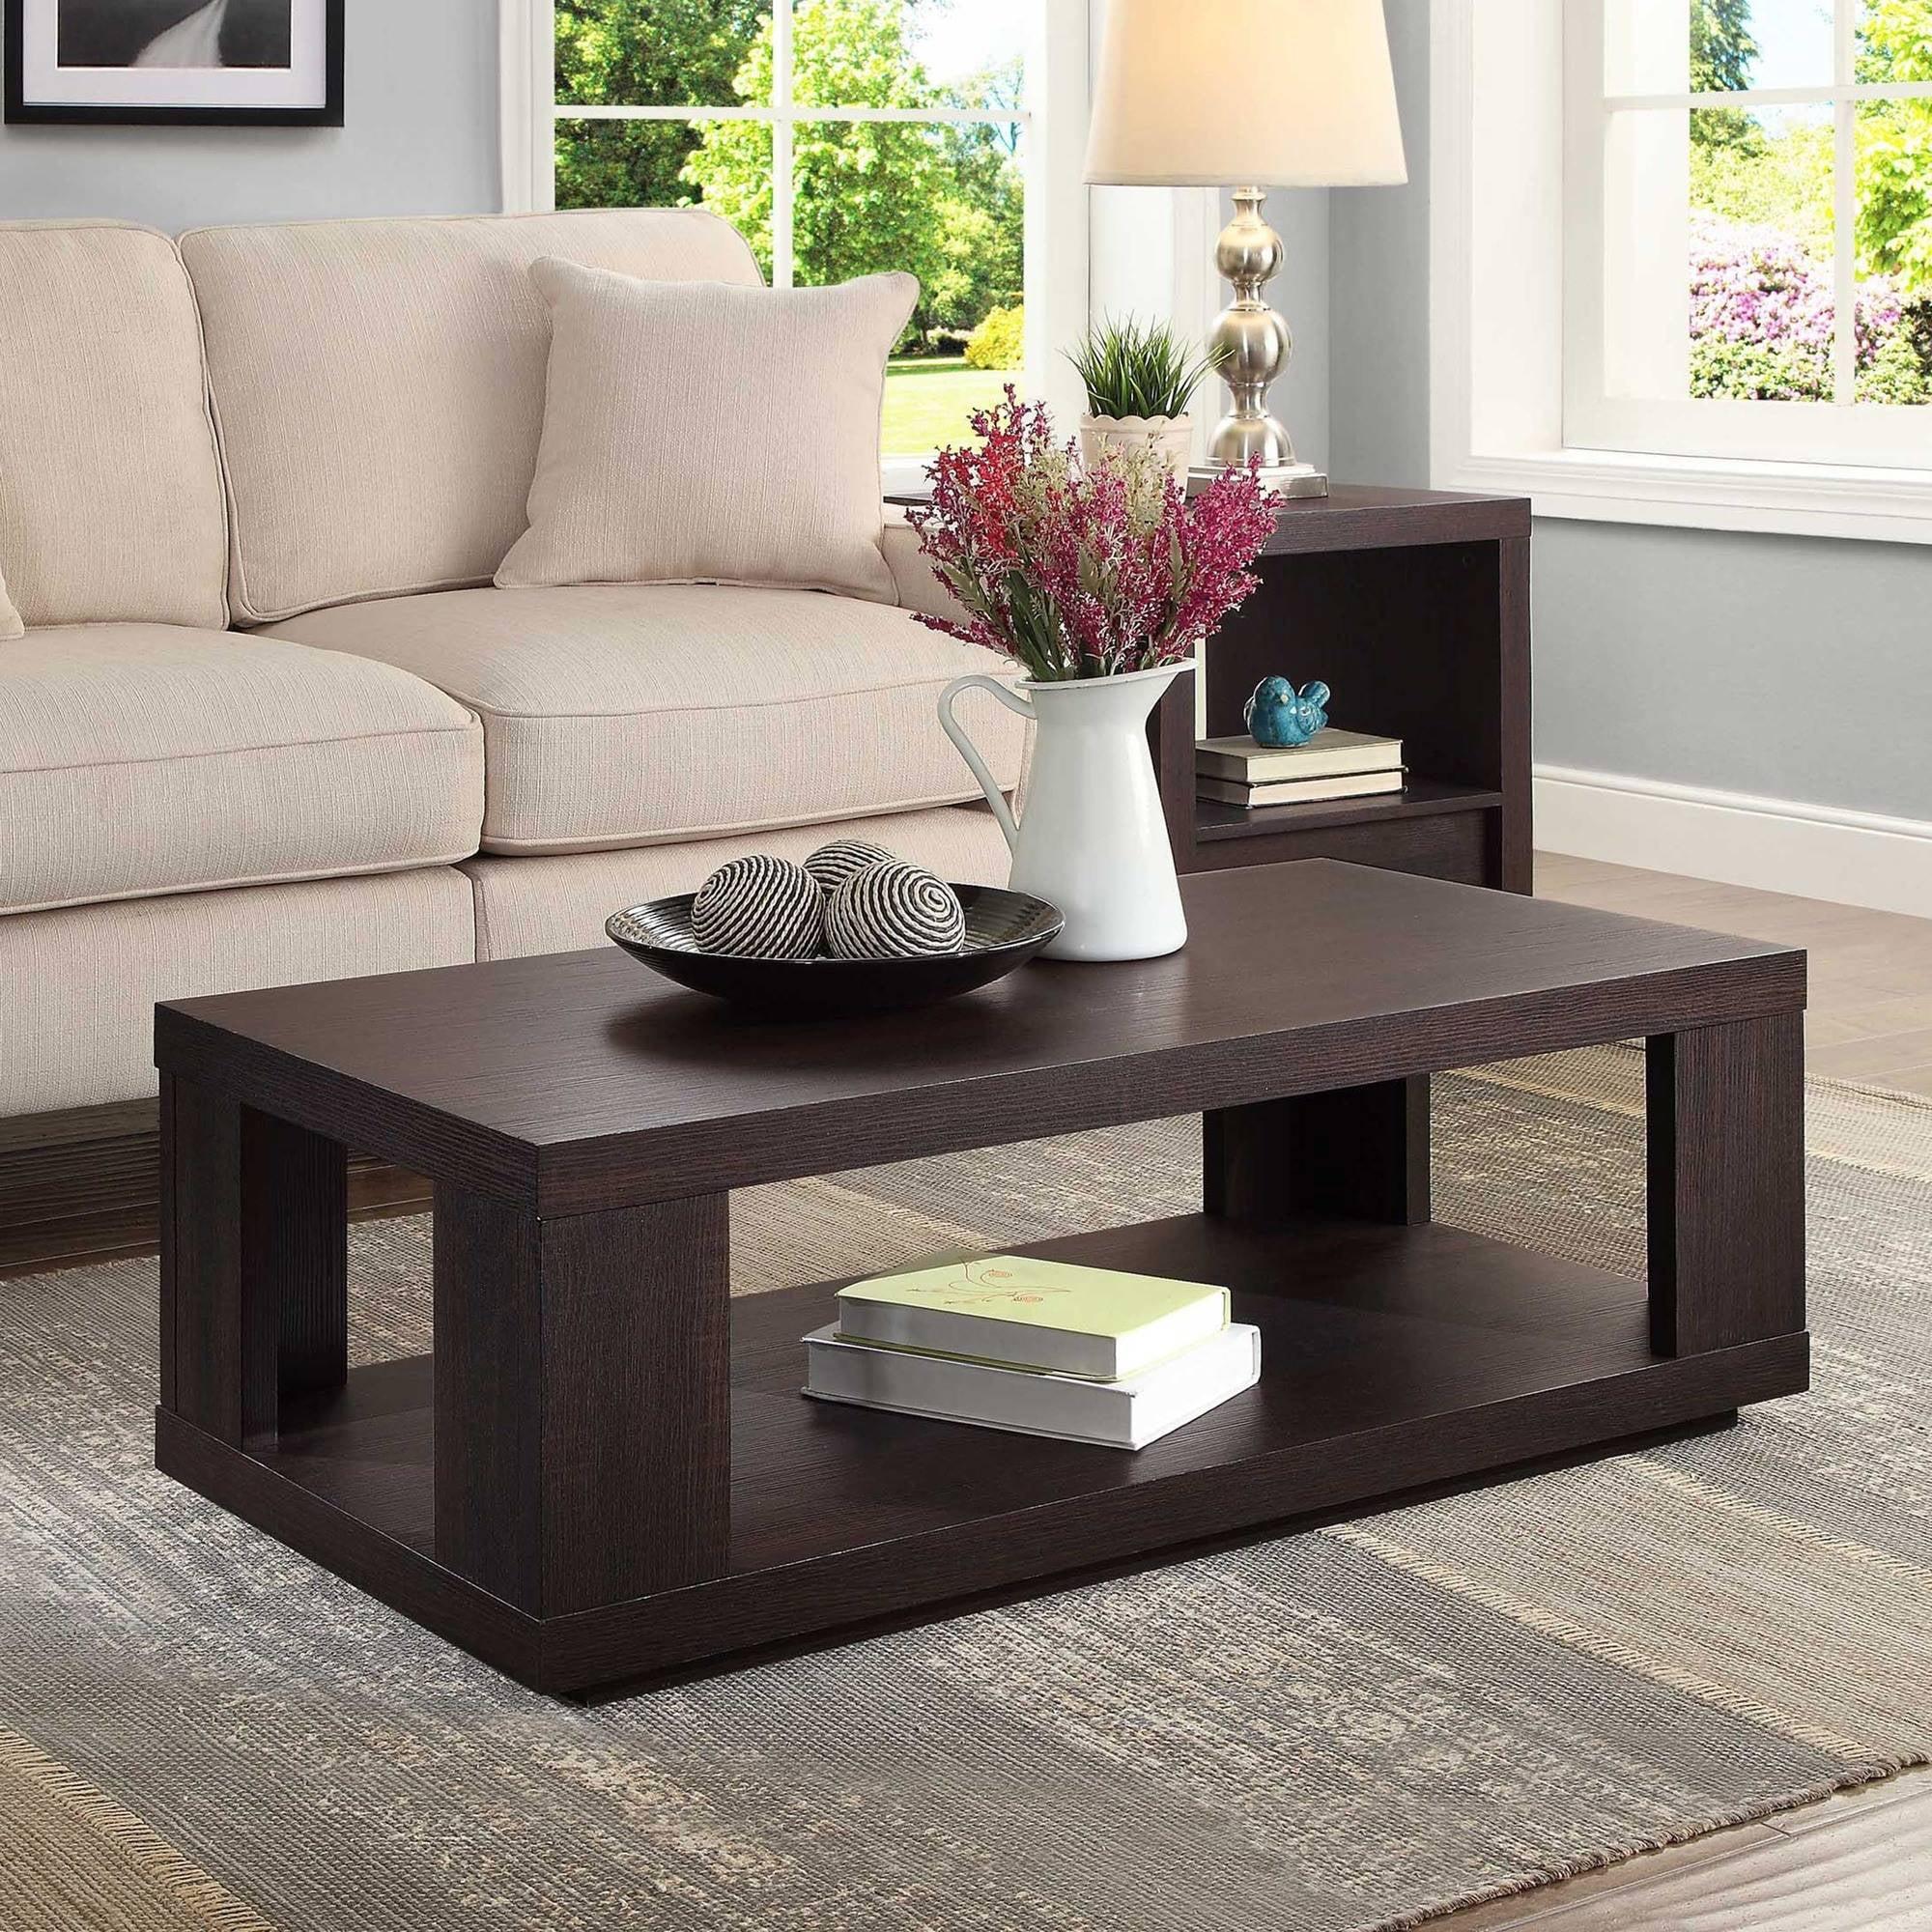 living room furniture walmartcom. beautiful ideas. Home Design Ideas